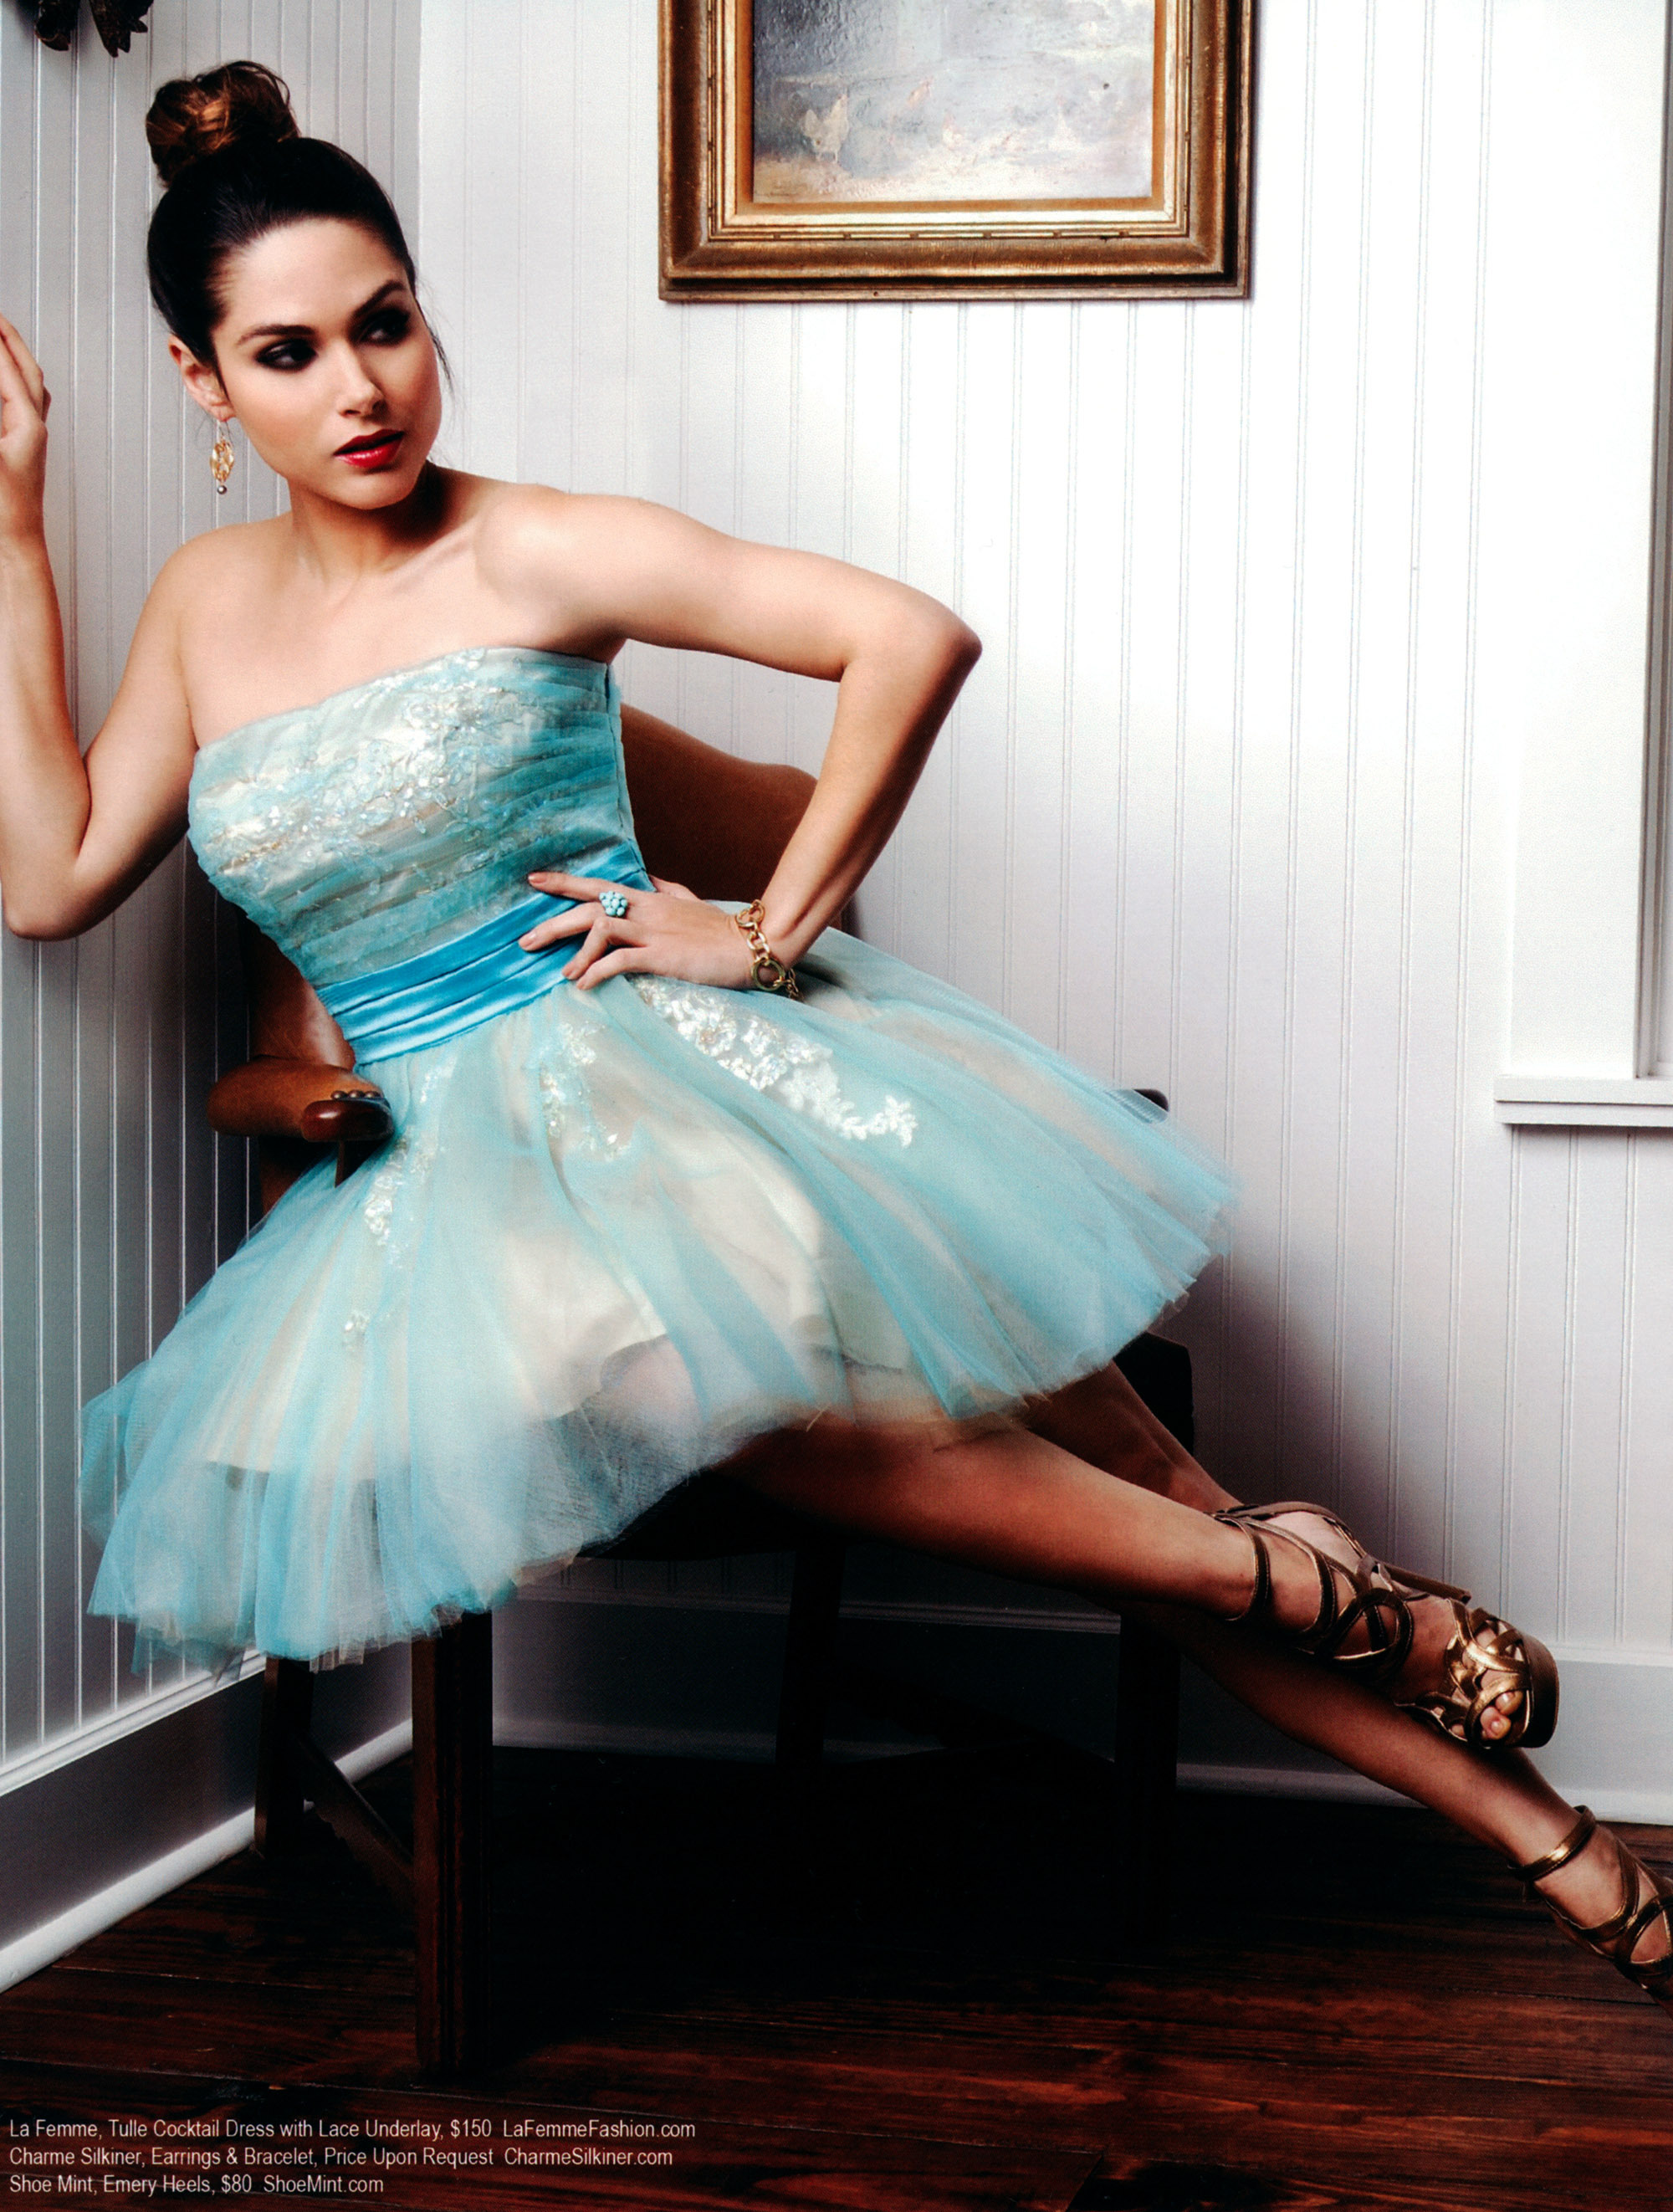 http://pics.wikifeet.com/Fernanda-Machado-Feet-1276717.jpg